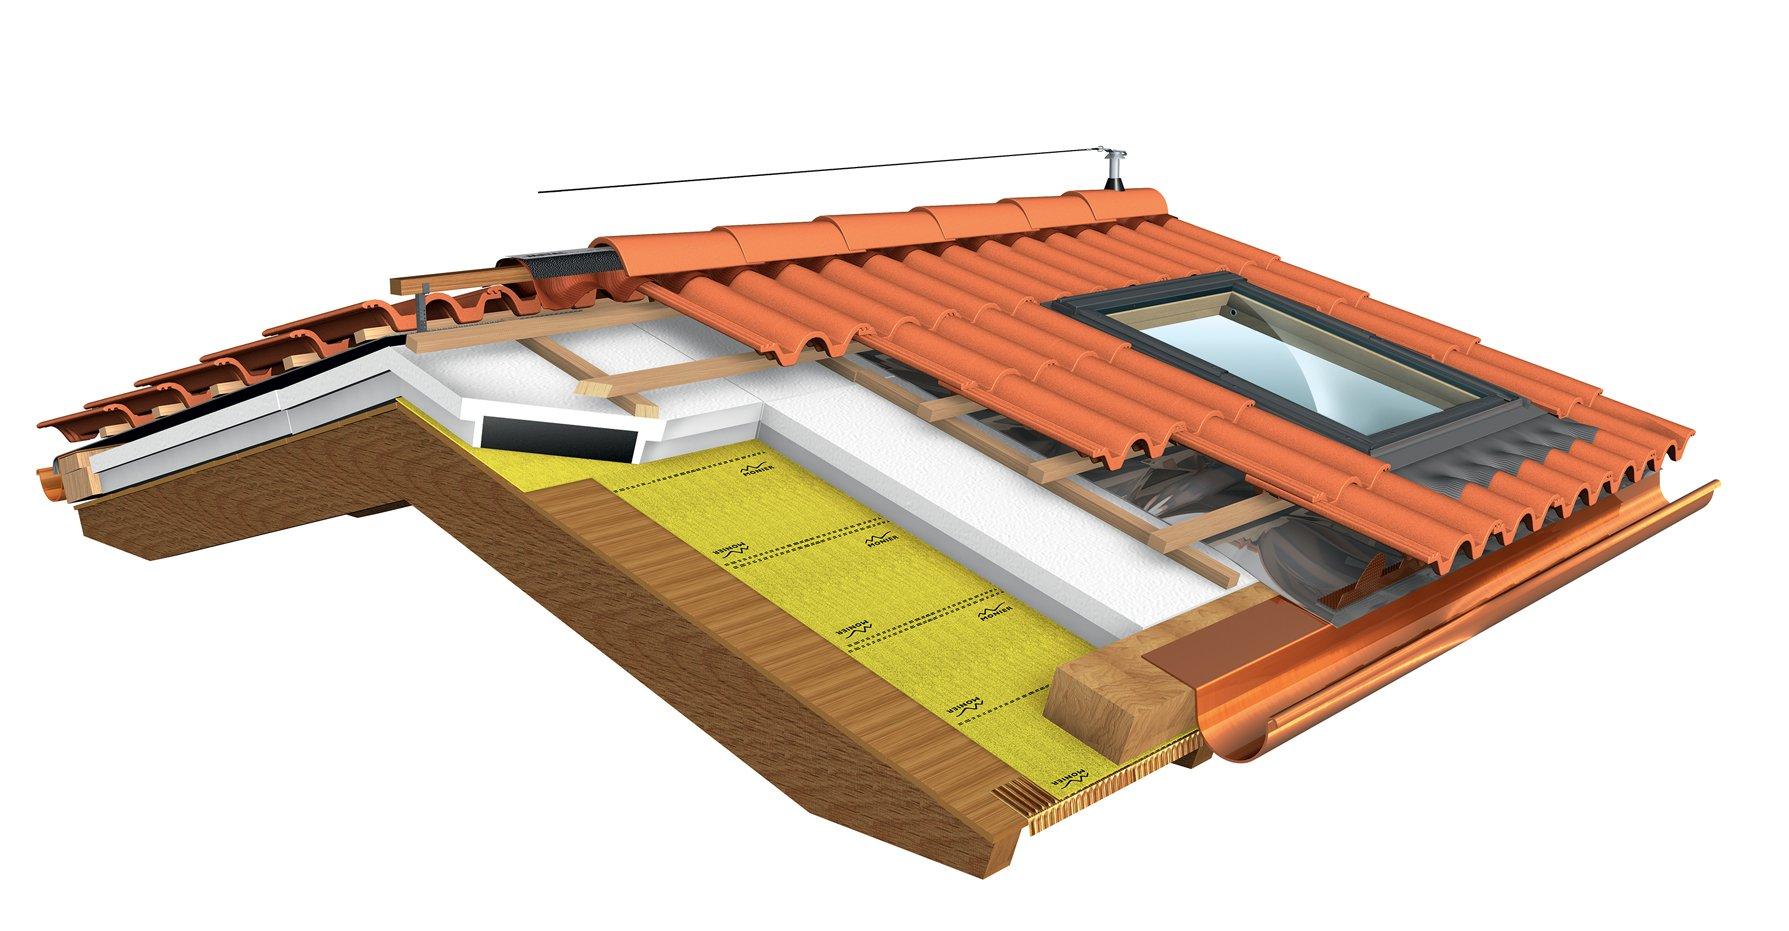 Wierer velux cose di casa for Velux tetto in legno